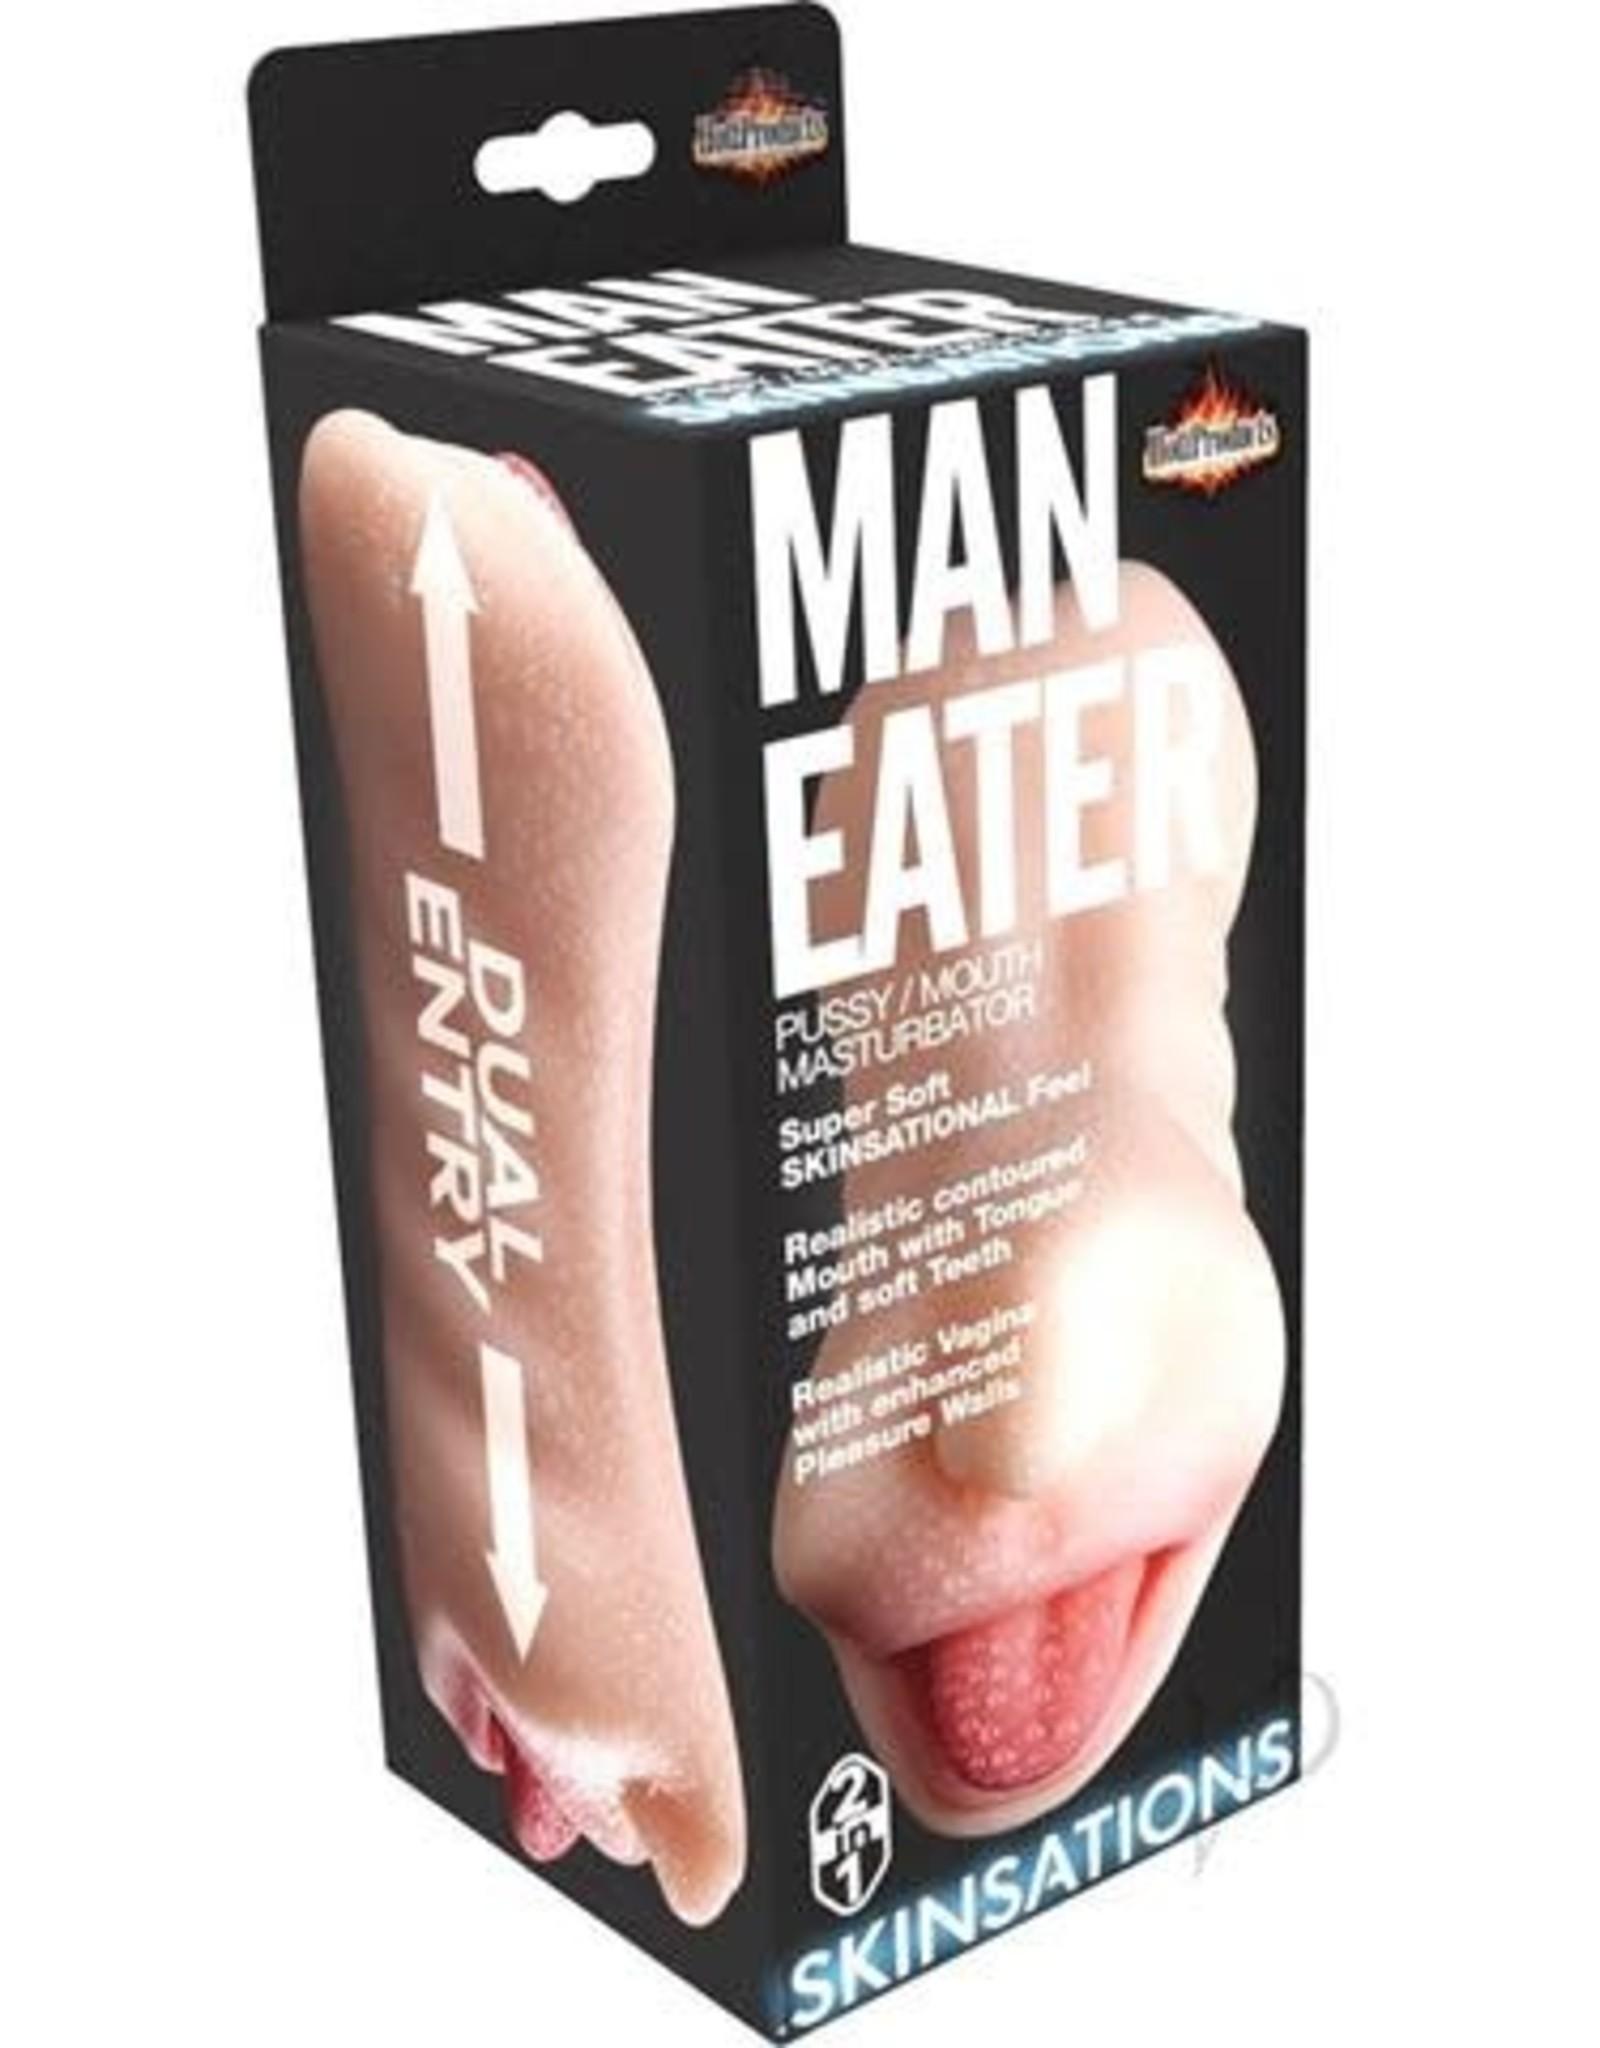 Hott Products Man Eater - 2 in 1 Masturbator